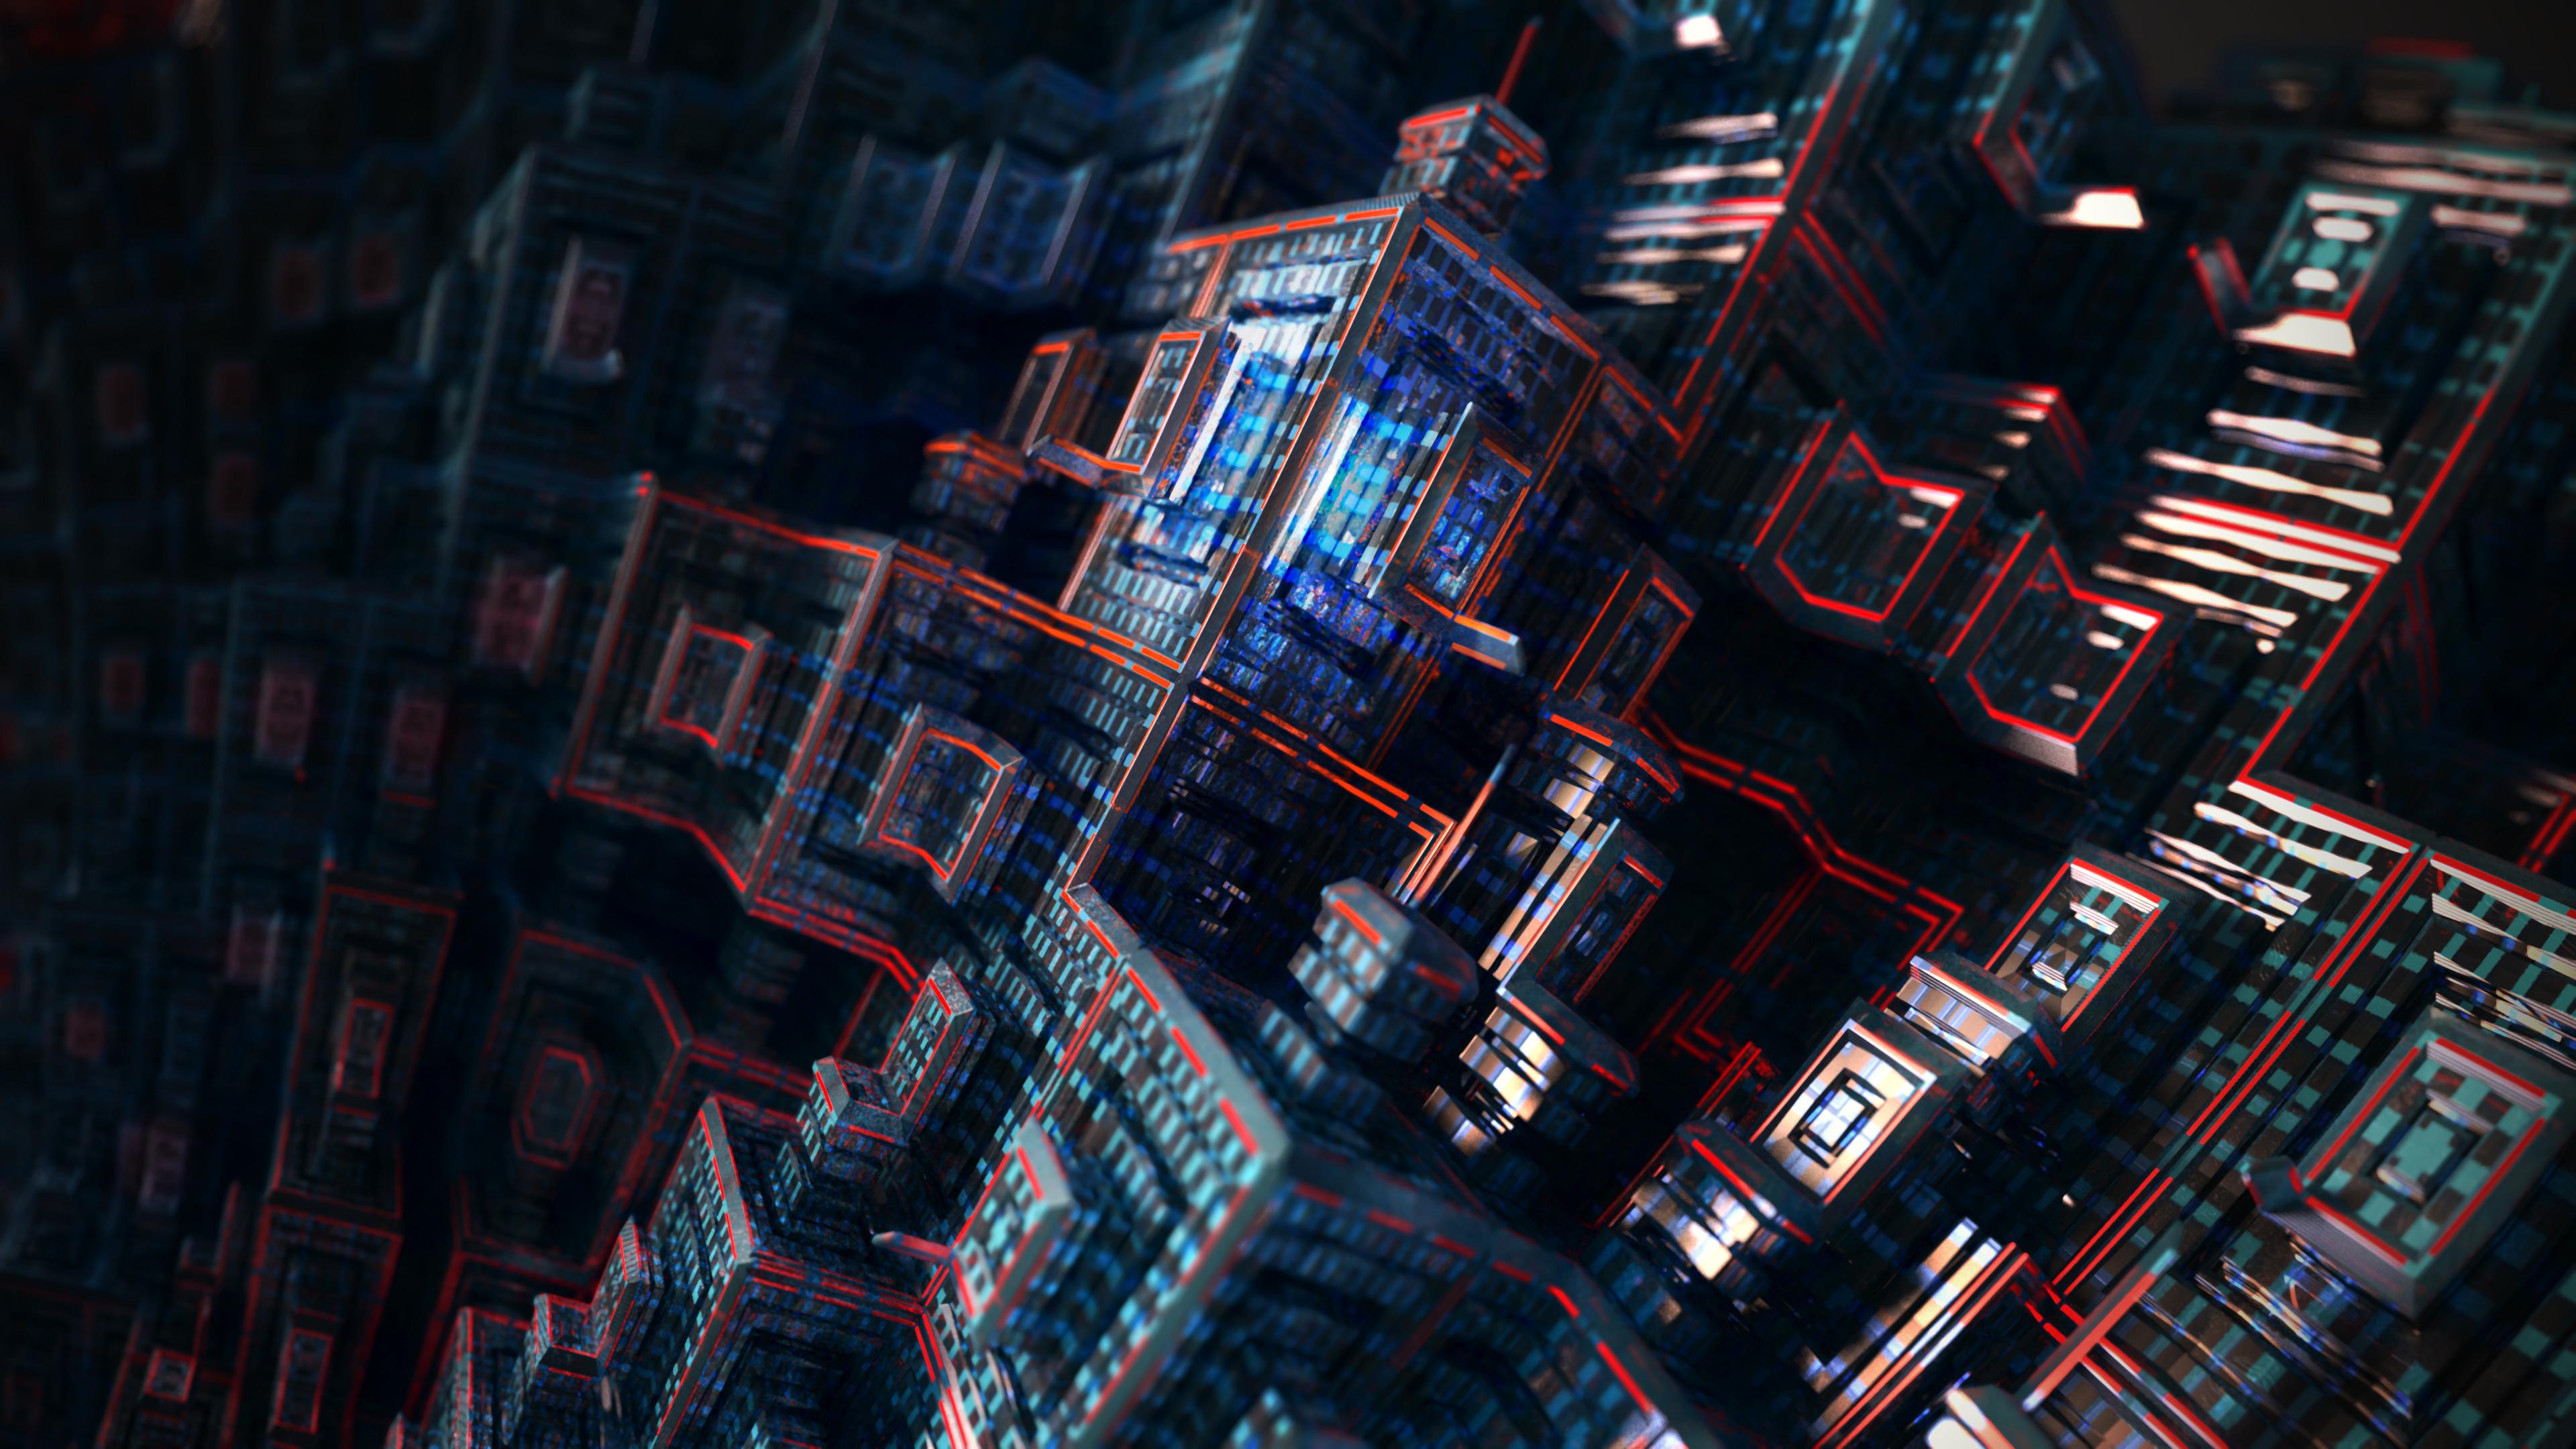 Download 3840x2400 Wallpaper Fractals Dark Cubes Abstract 4k Ultra Hd 16 10 Widescreen 3840x2400 Hd Image Background 2925